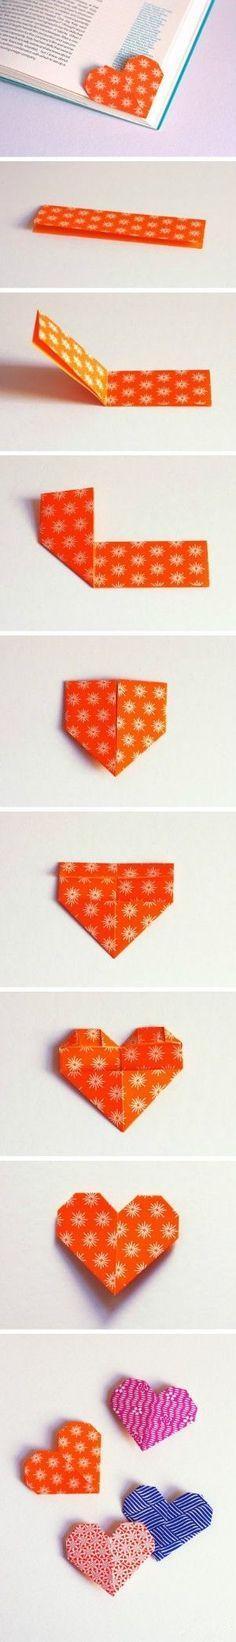 Origami Heart Bookmark: